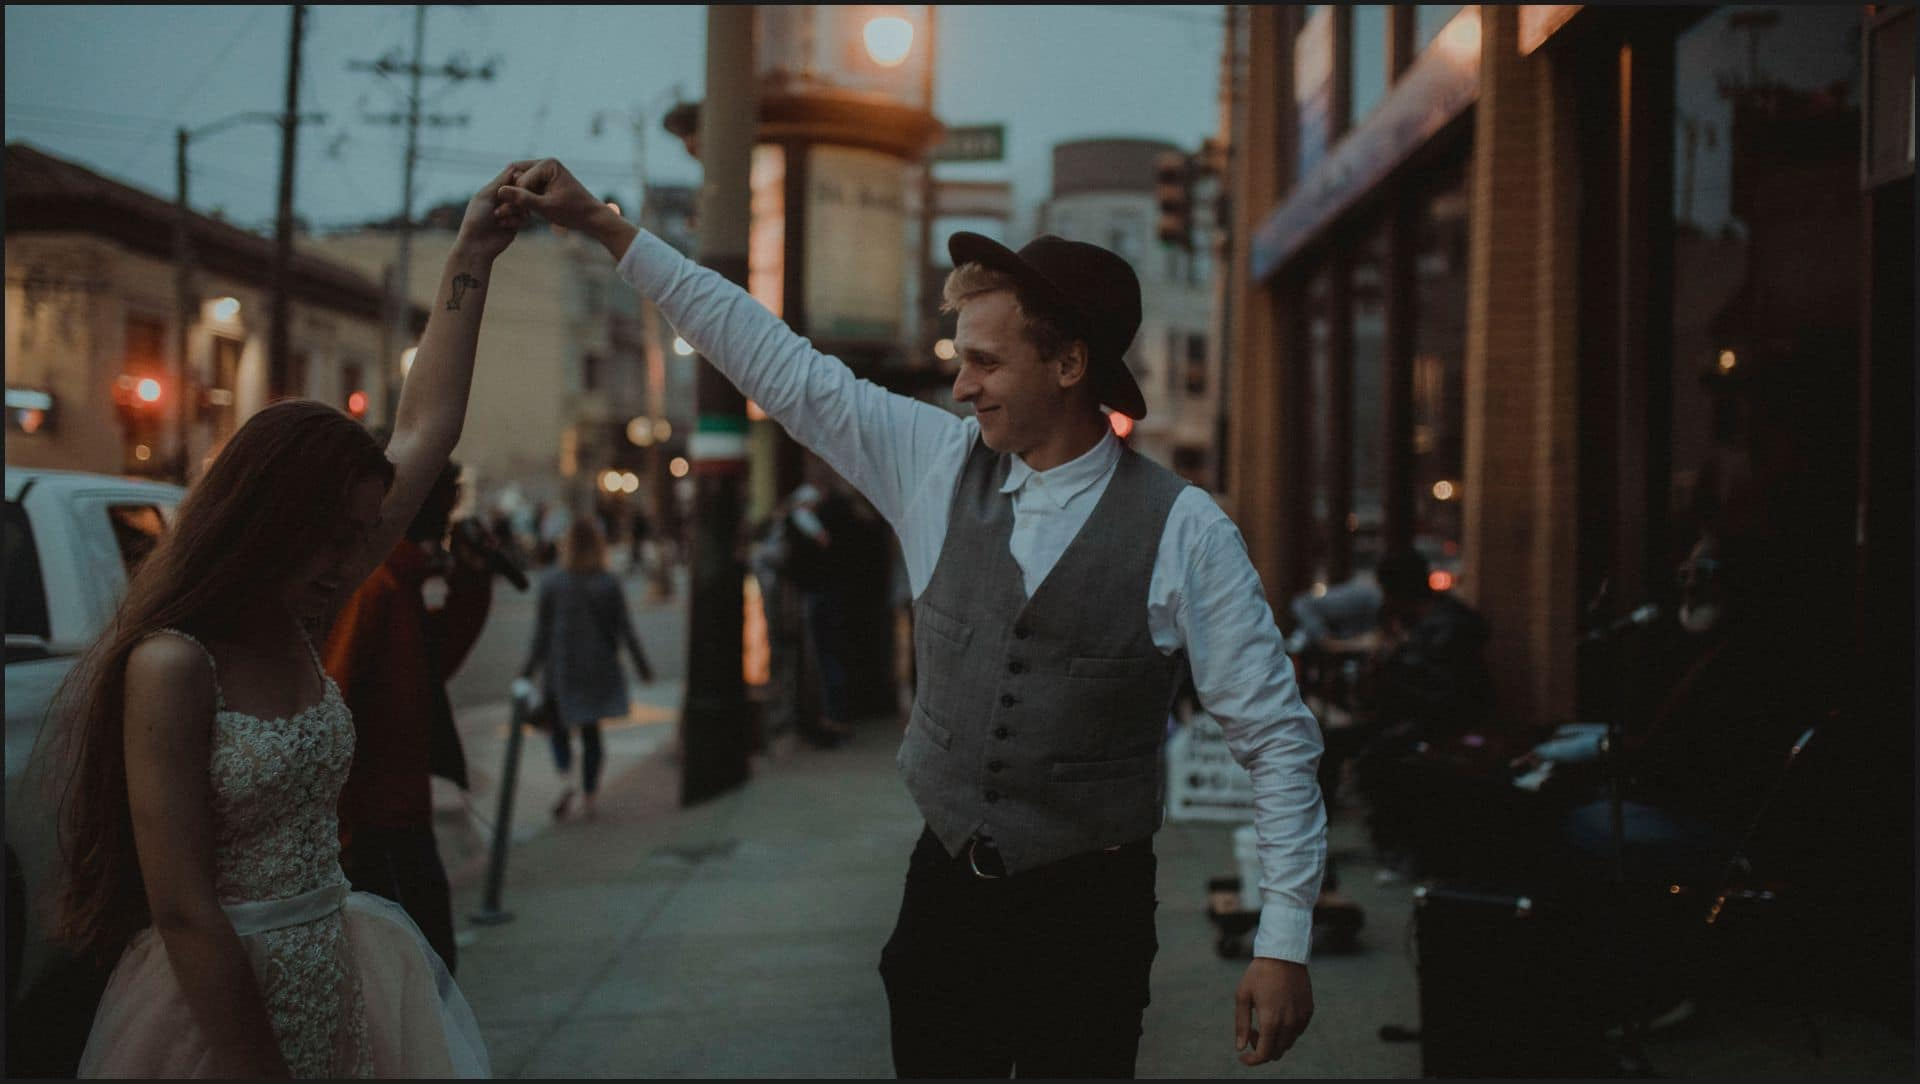 bride, groom, dancing, candid, san francisco, california, elopement wedding